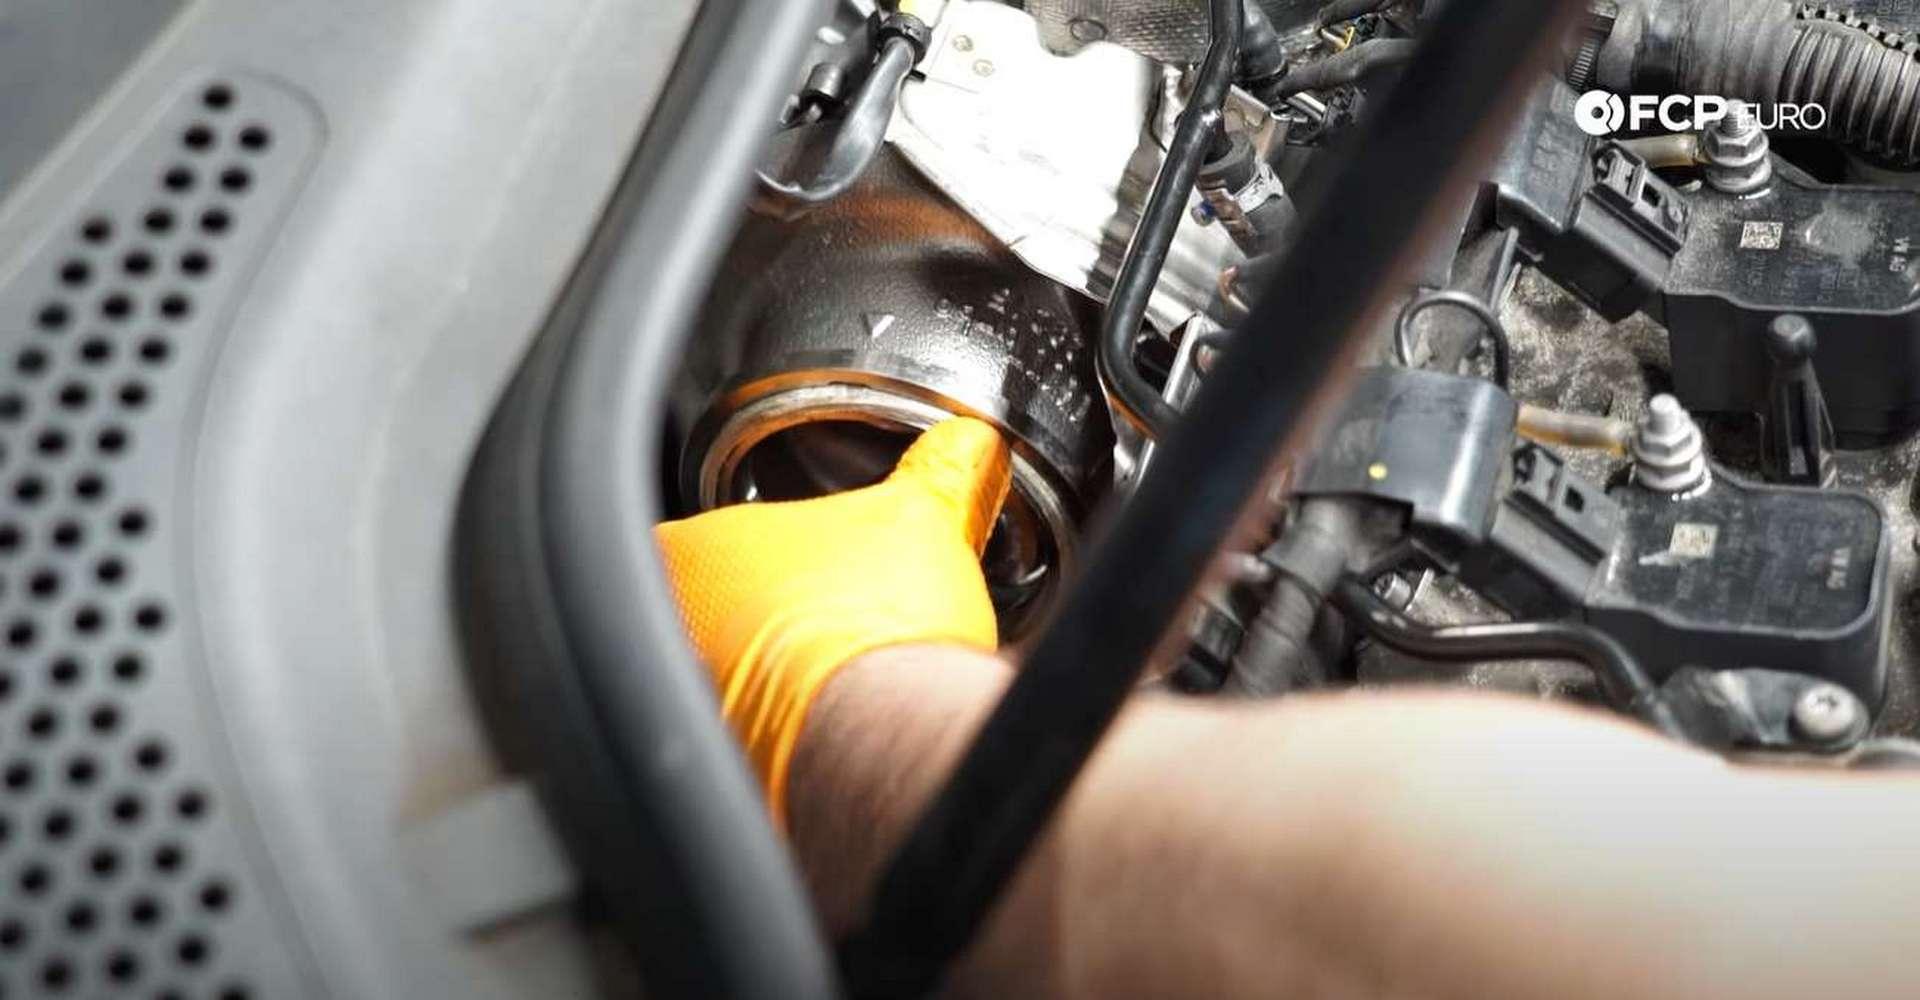 DIY MK7 VW GTI Turbocharger Upgrade installing the new exhaust housing gasket